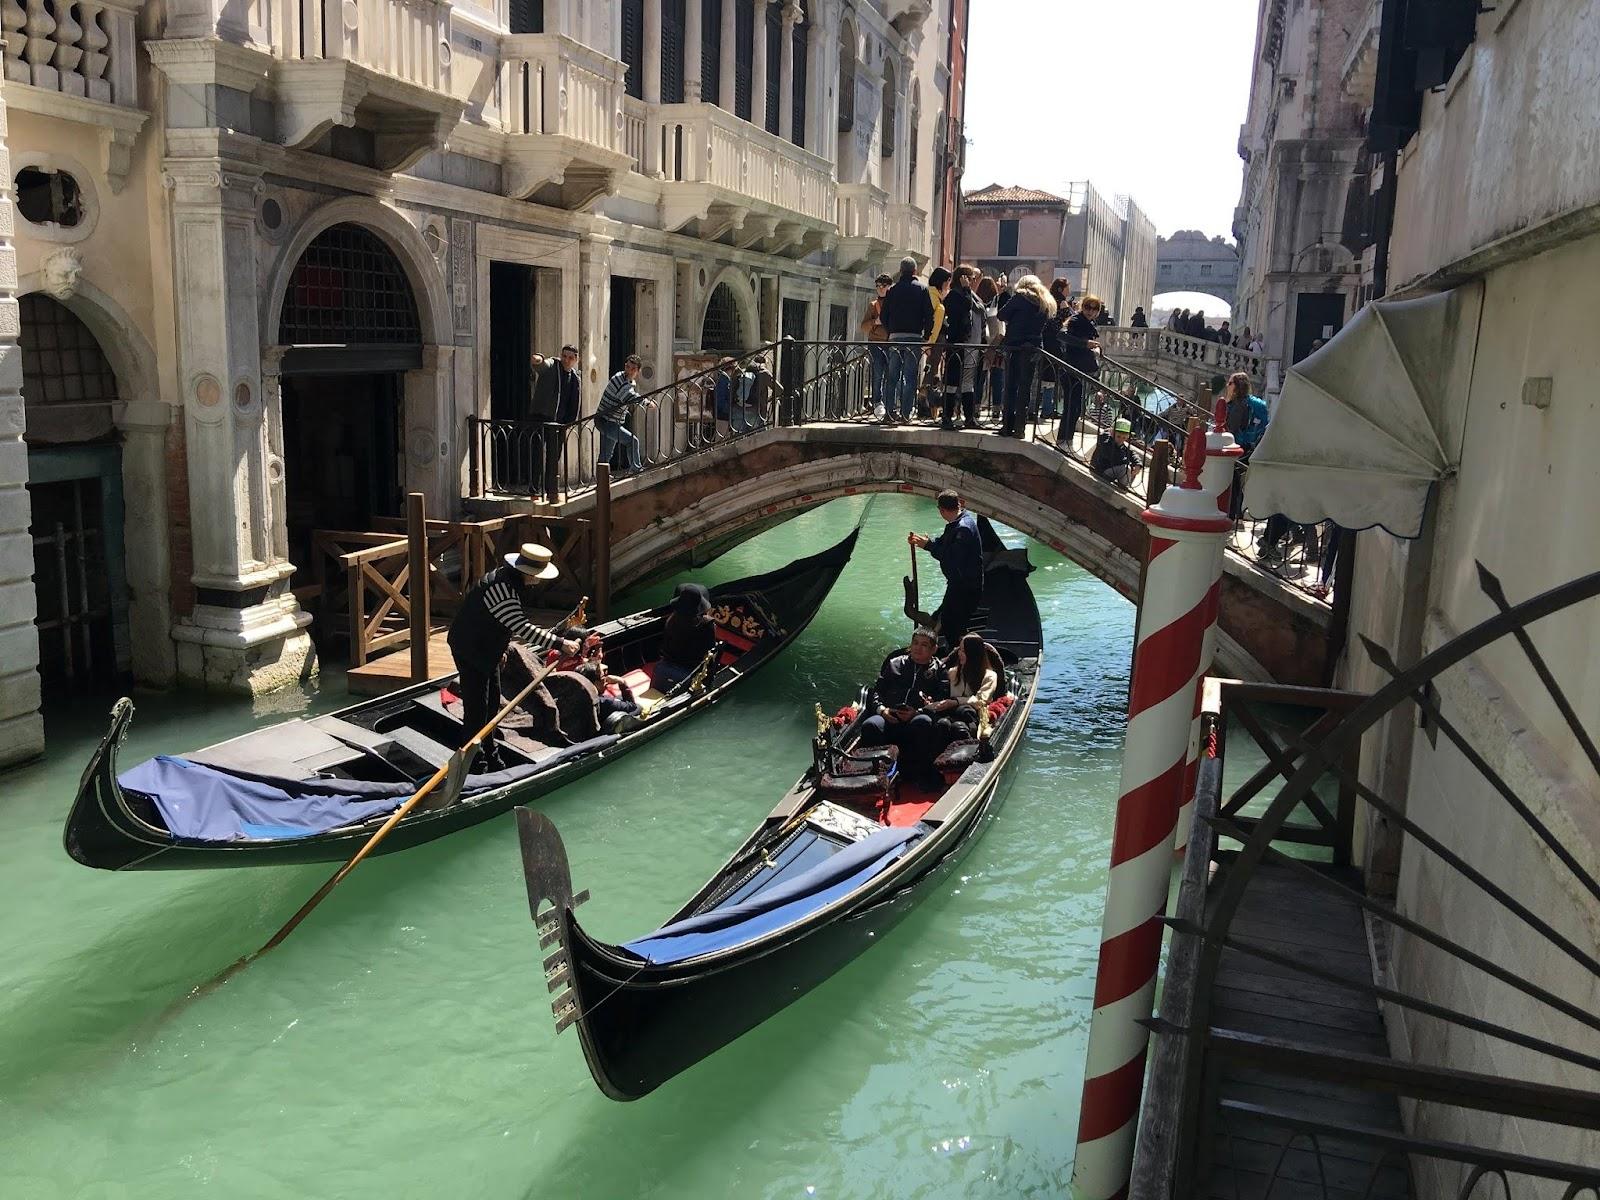 gondolas in a canal in venice